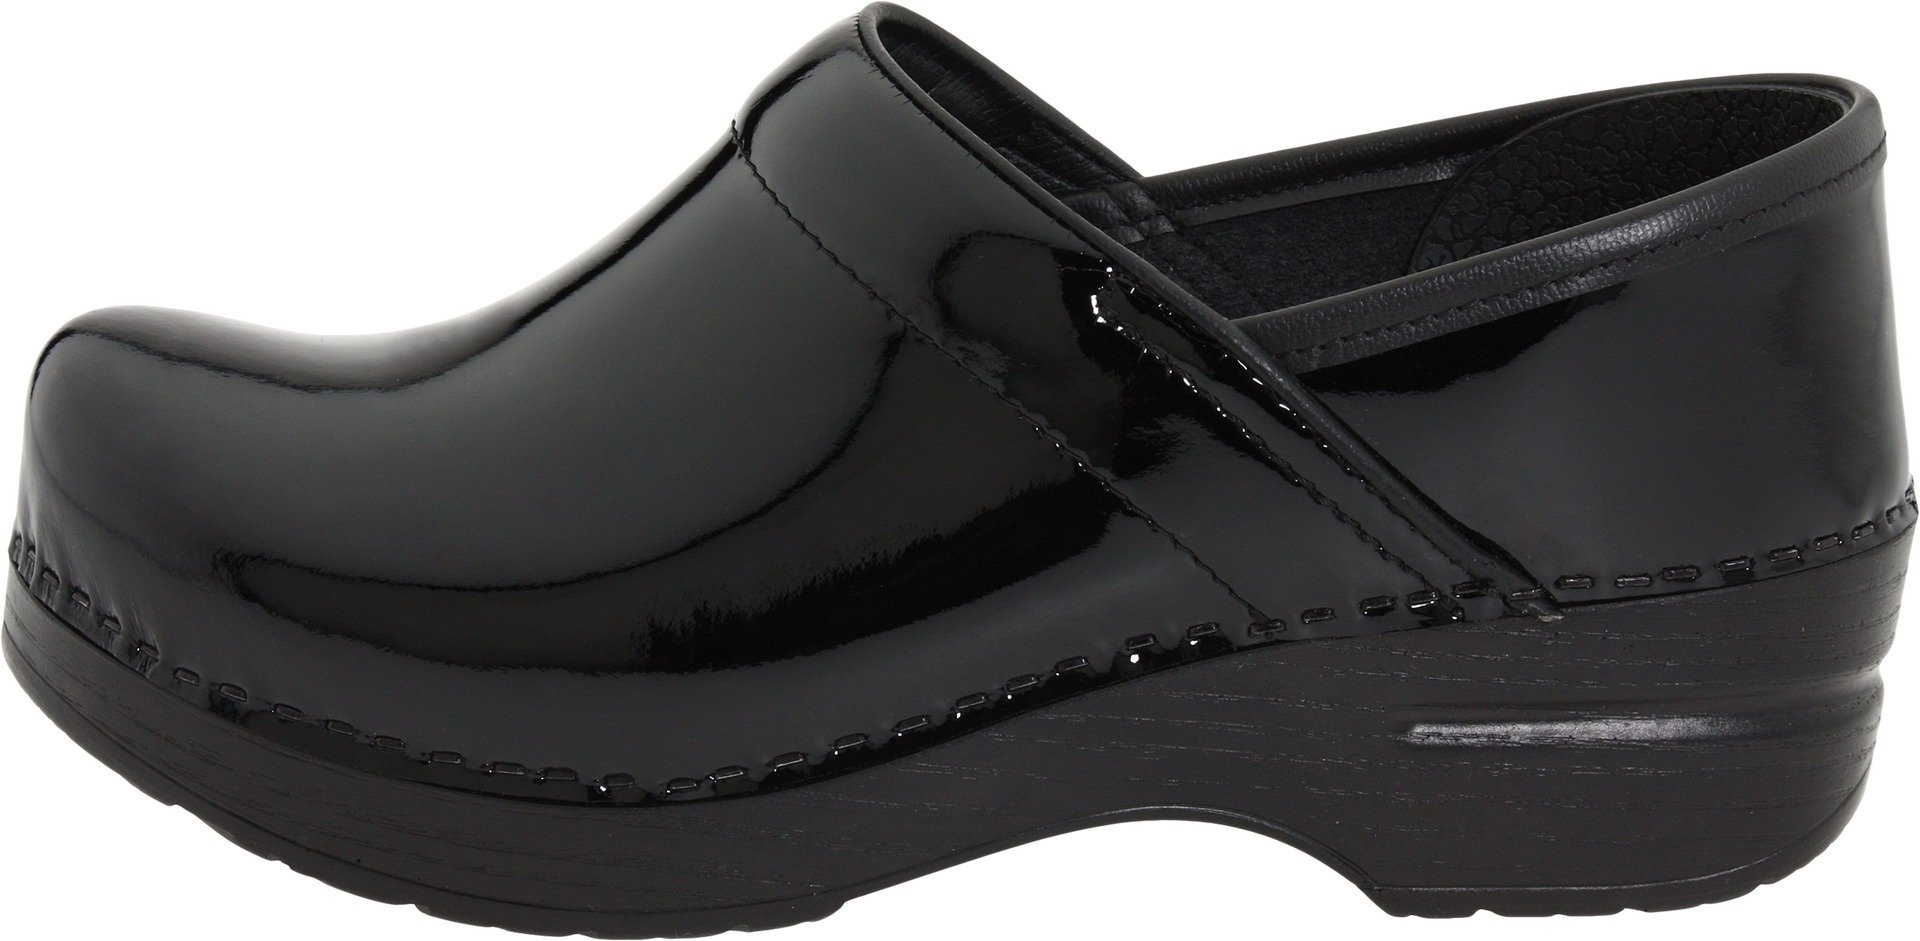 Dansko Women's Professional Patent Leather Clog,Black Patent,37 EU / 6.5-7 B(M) US by Dansko (Image #5)